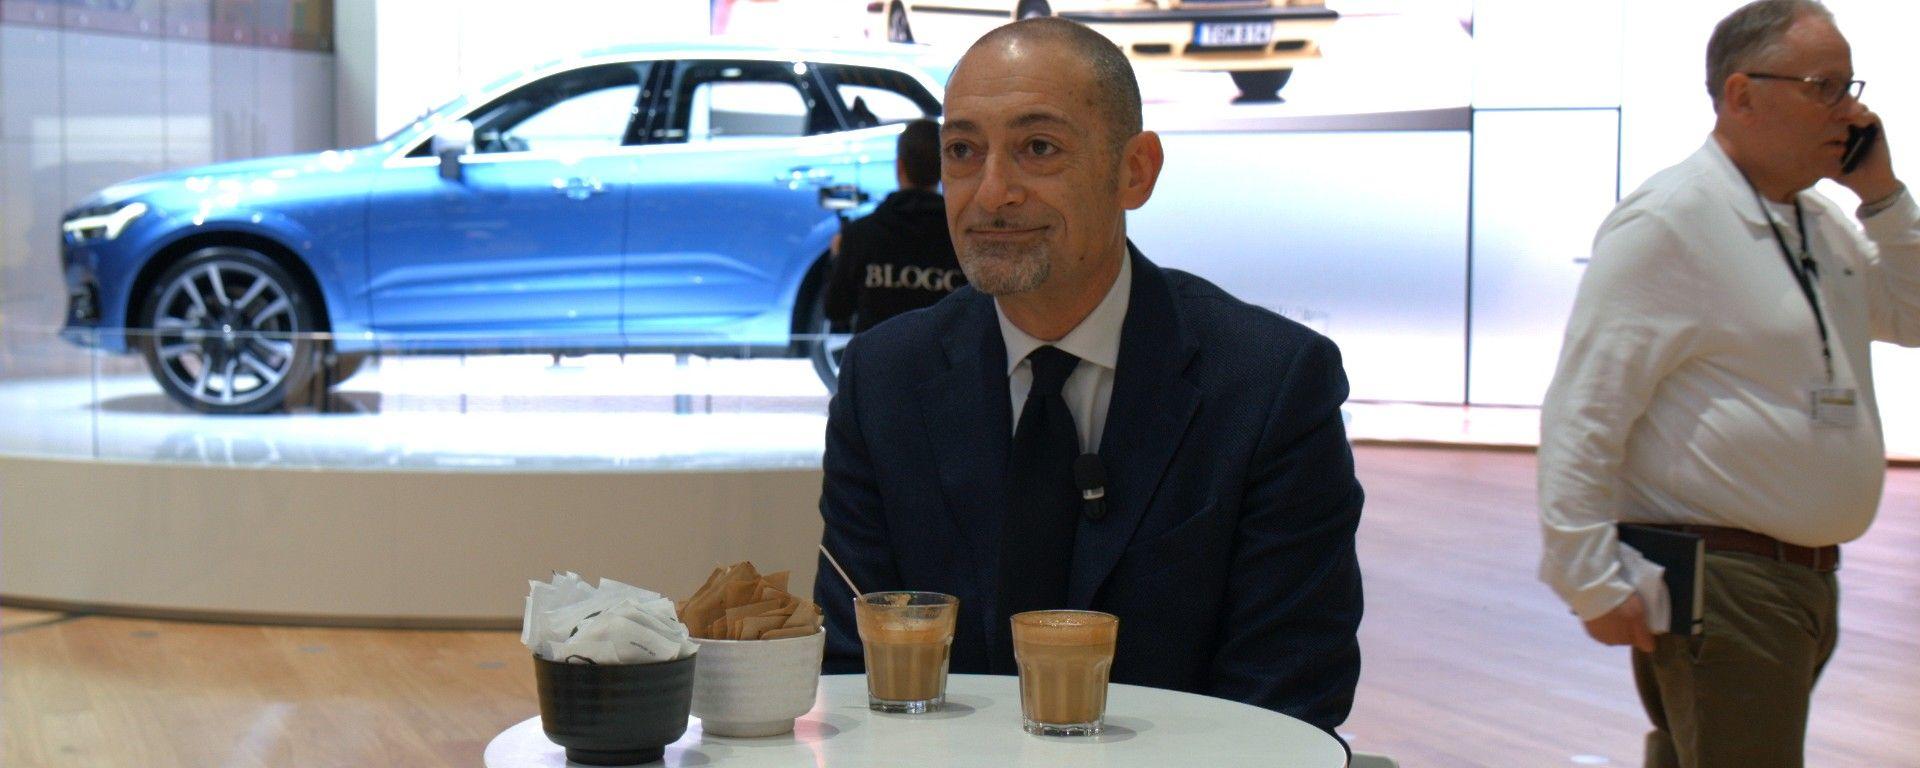 Volvo XC60 2017: quanto manca alla guida autonoma?